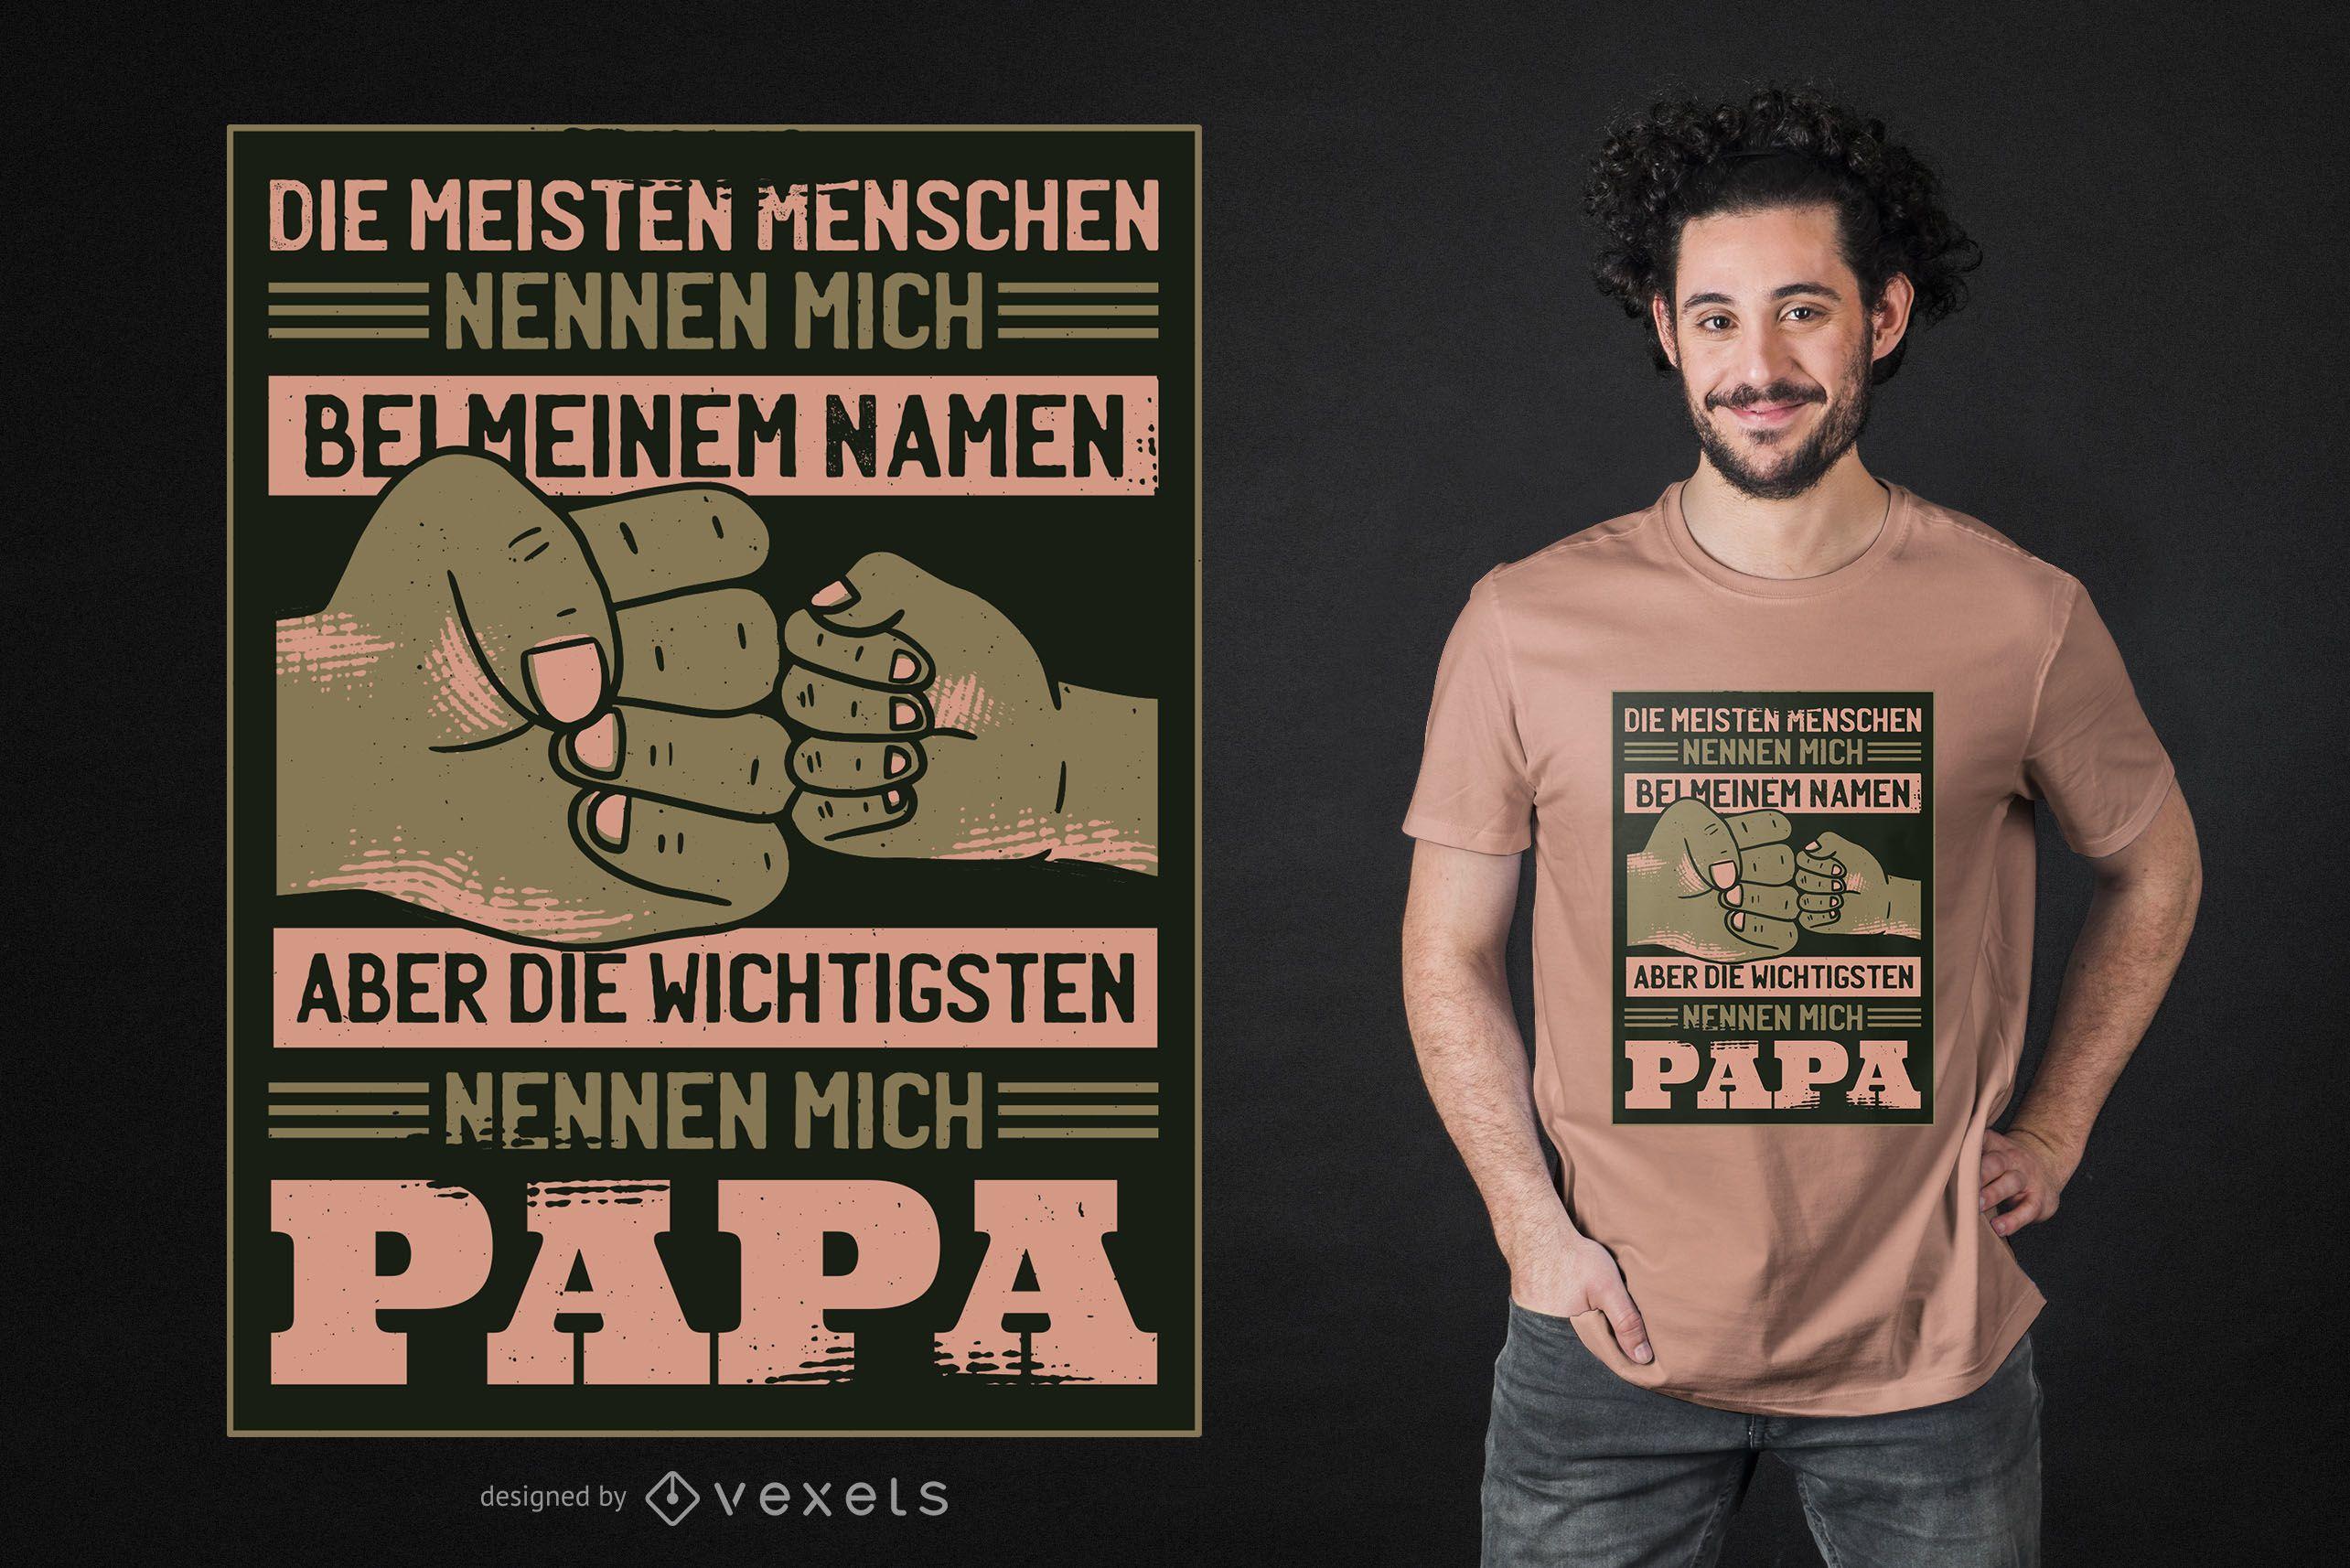 Diseño de camiseta de papá alemán cita